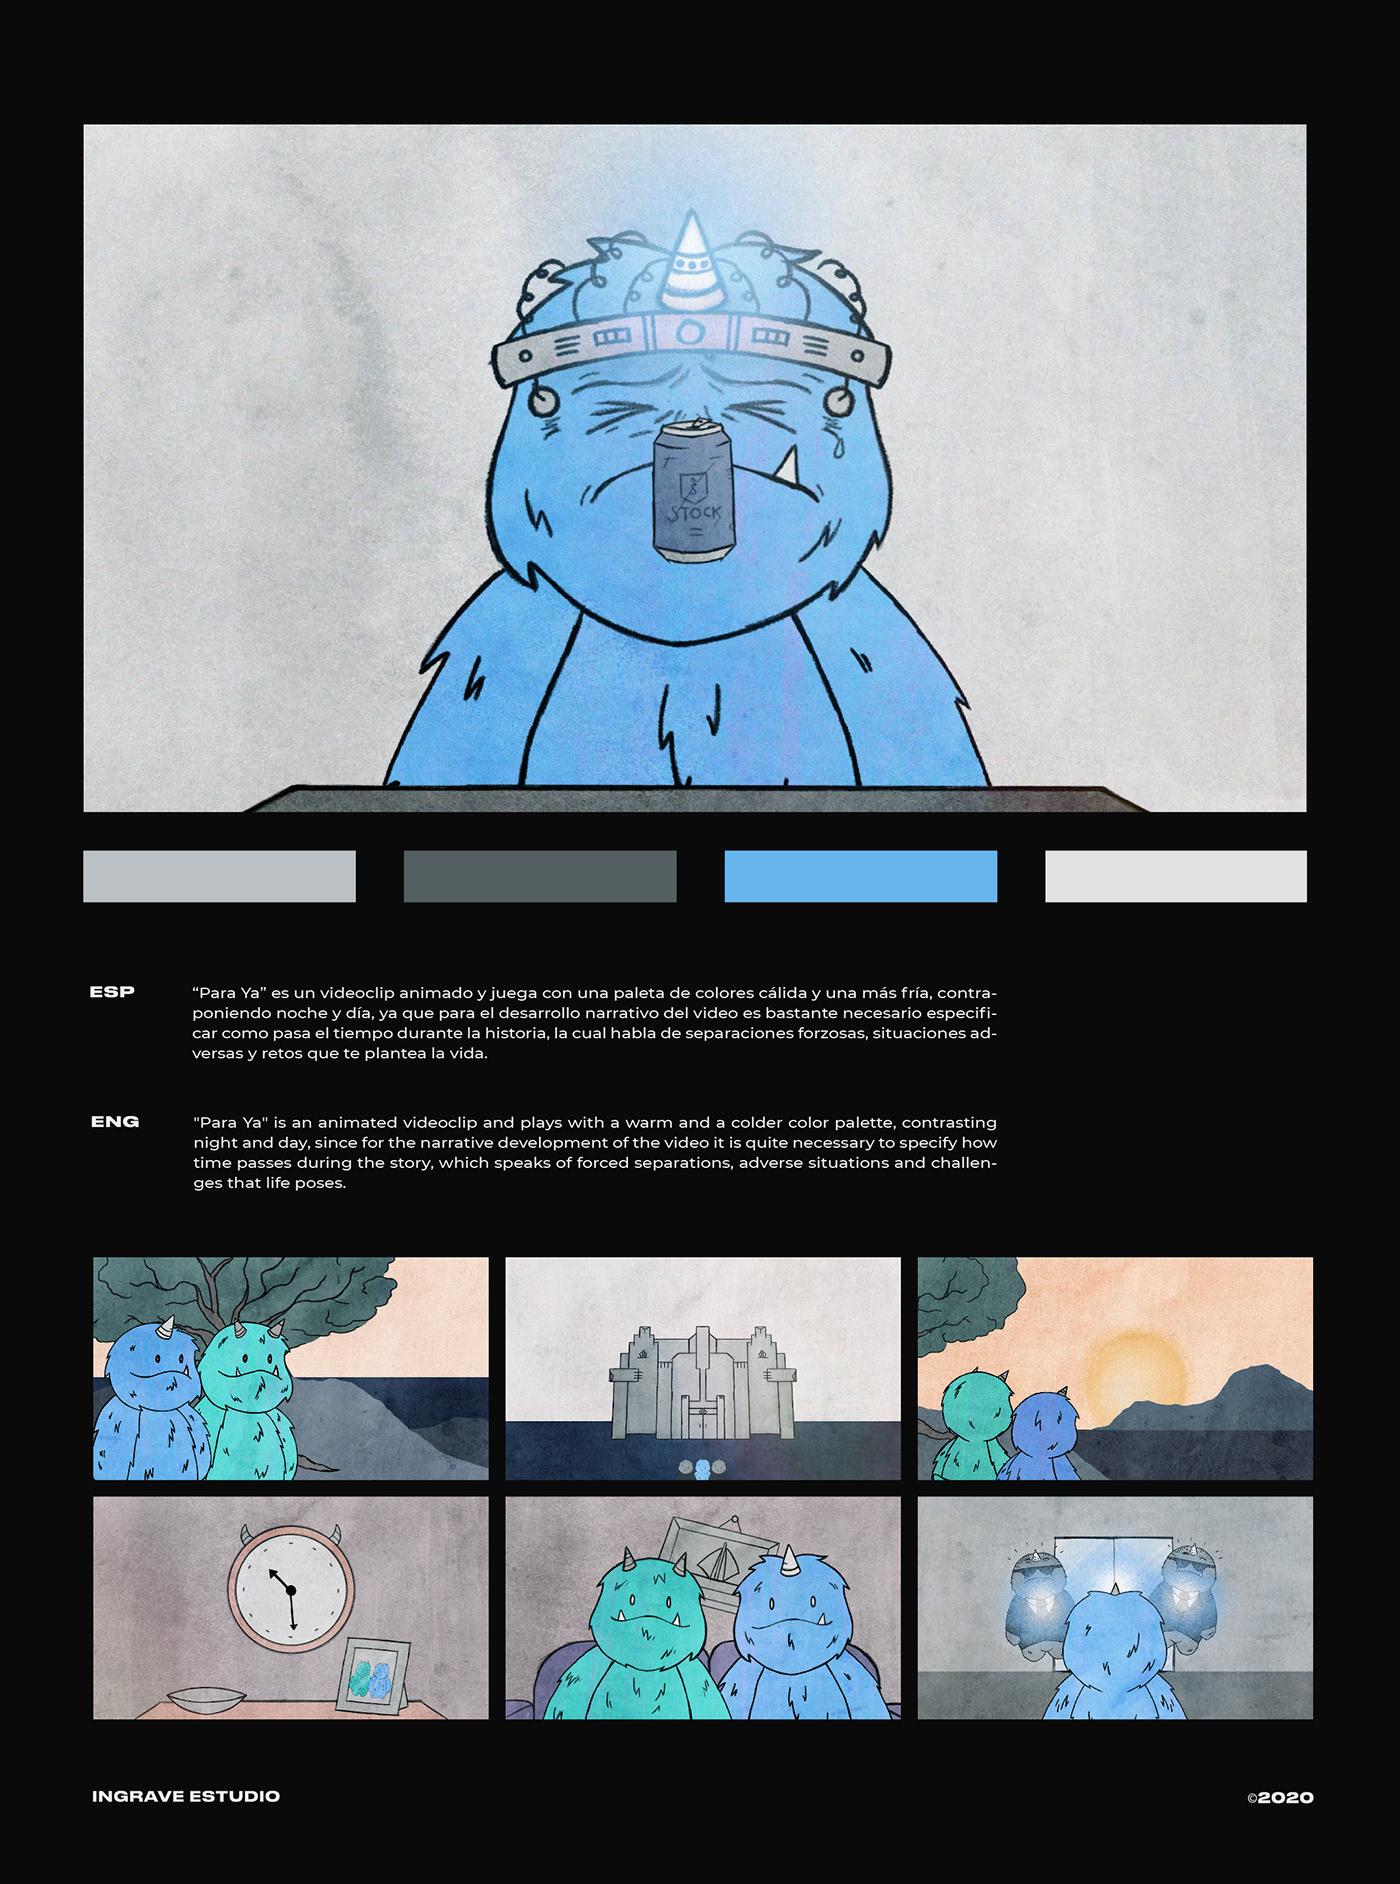 animacion ILLUSTRATION  motion motion graphics  music rulo y la contrabanda Videoclip